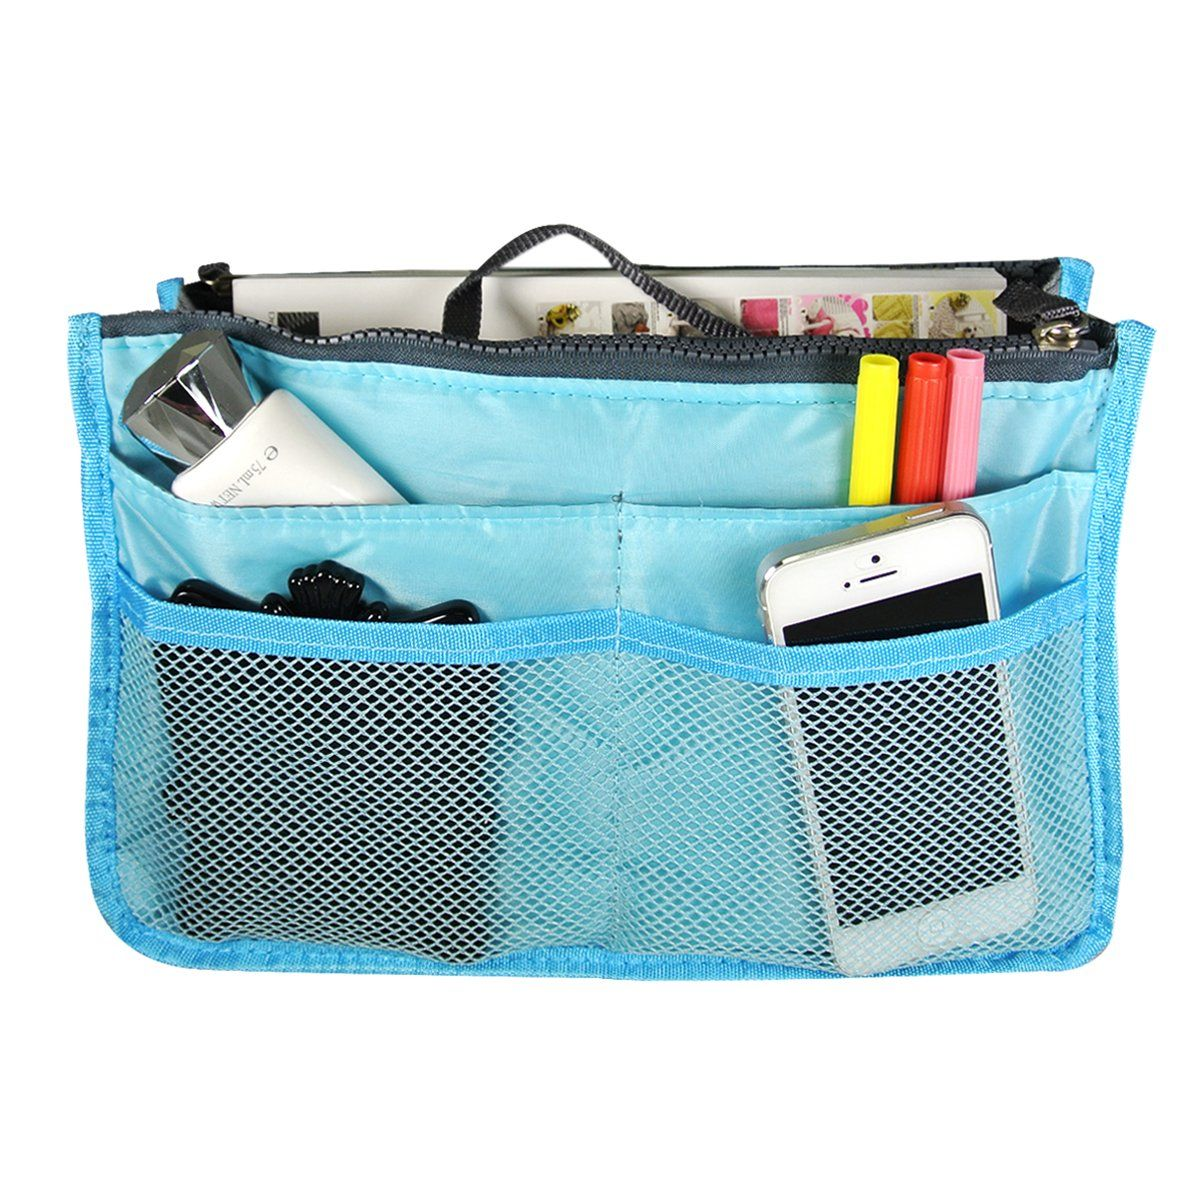 Amazon.com - Wrapables Unisex Bag Insert Organizer/Travel Bag ...